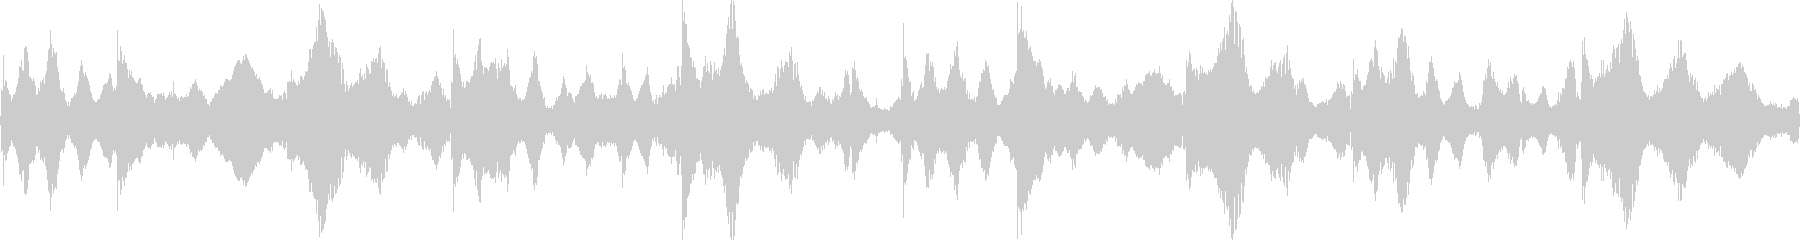 k005警告音/呼び出し音★ループ仕様の未再生の波形